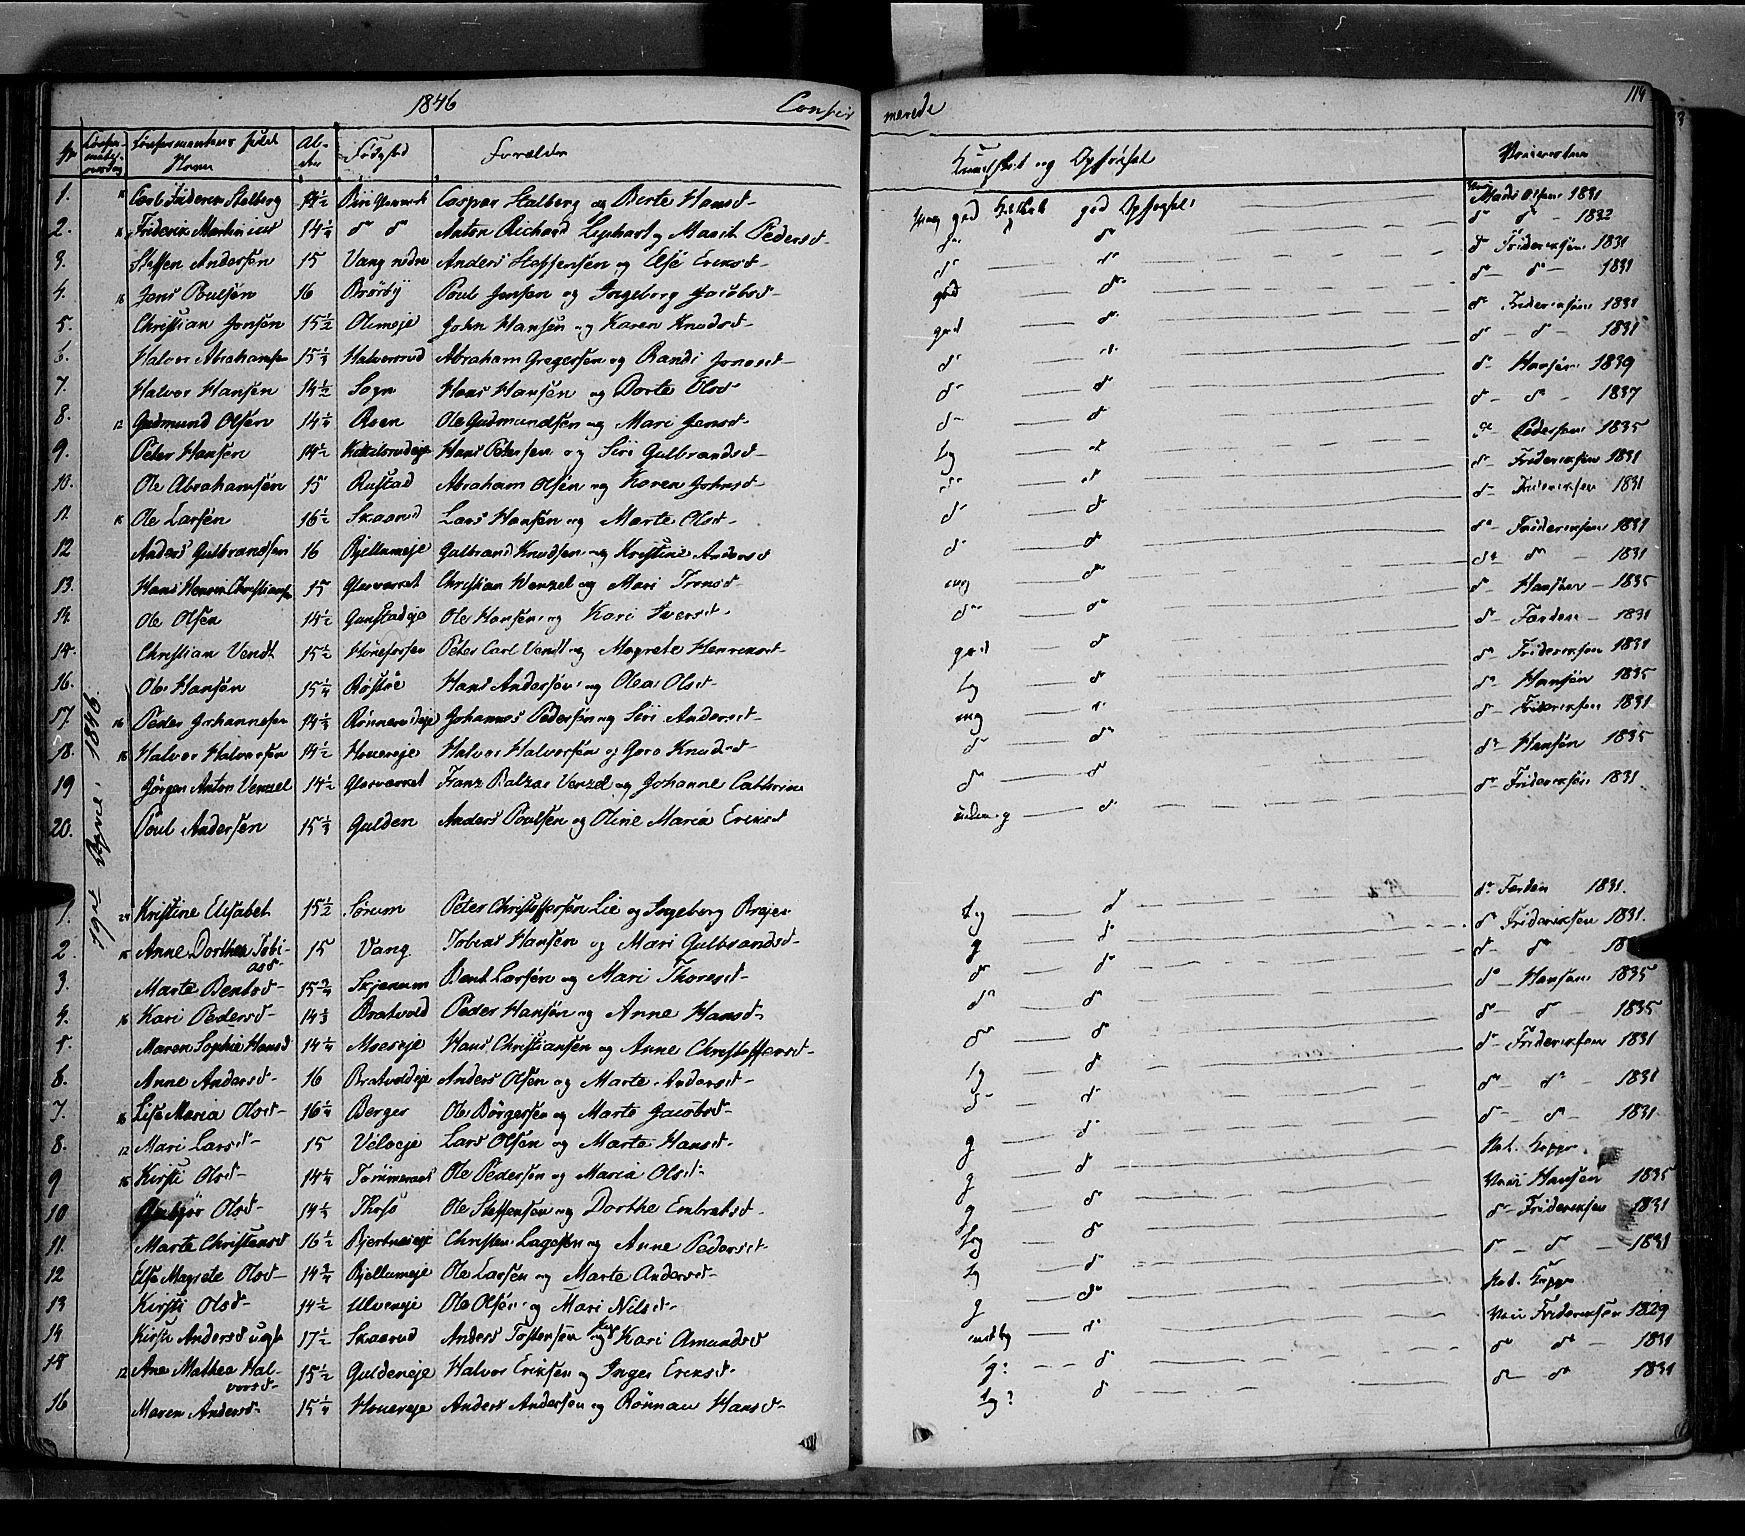 SAH, Jevnaker prestekontor, Ministerialbok nr. 6, 1837-1857, s. 114